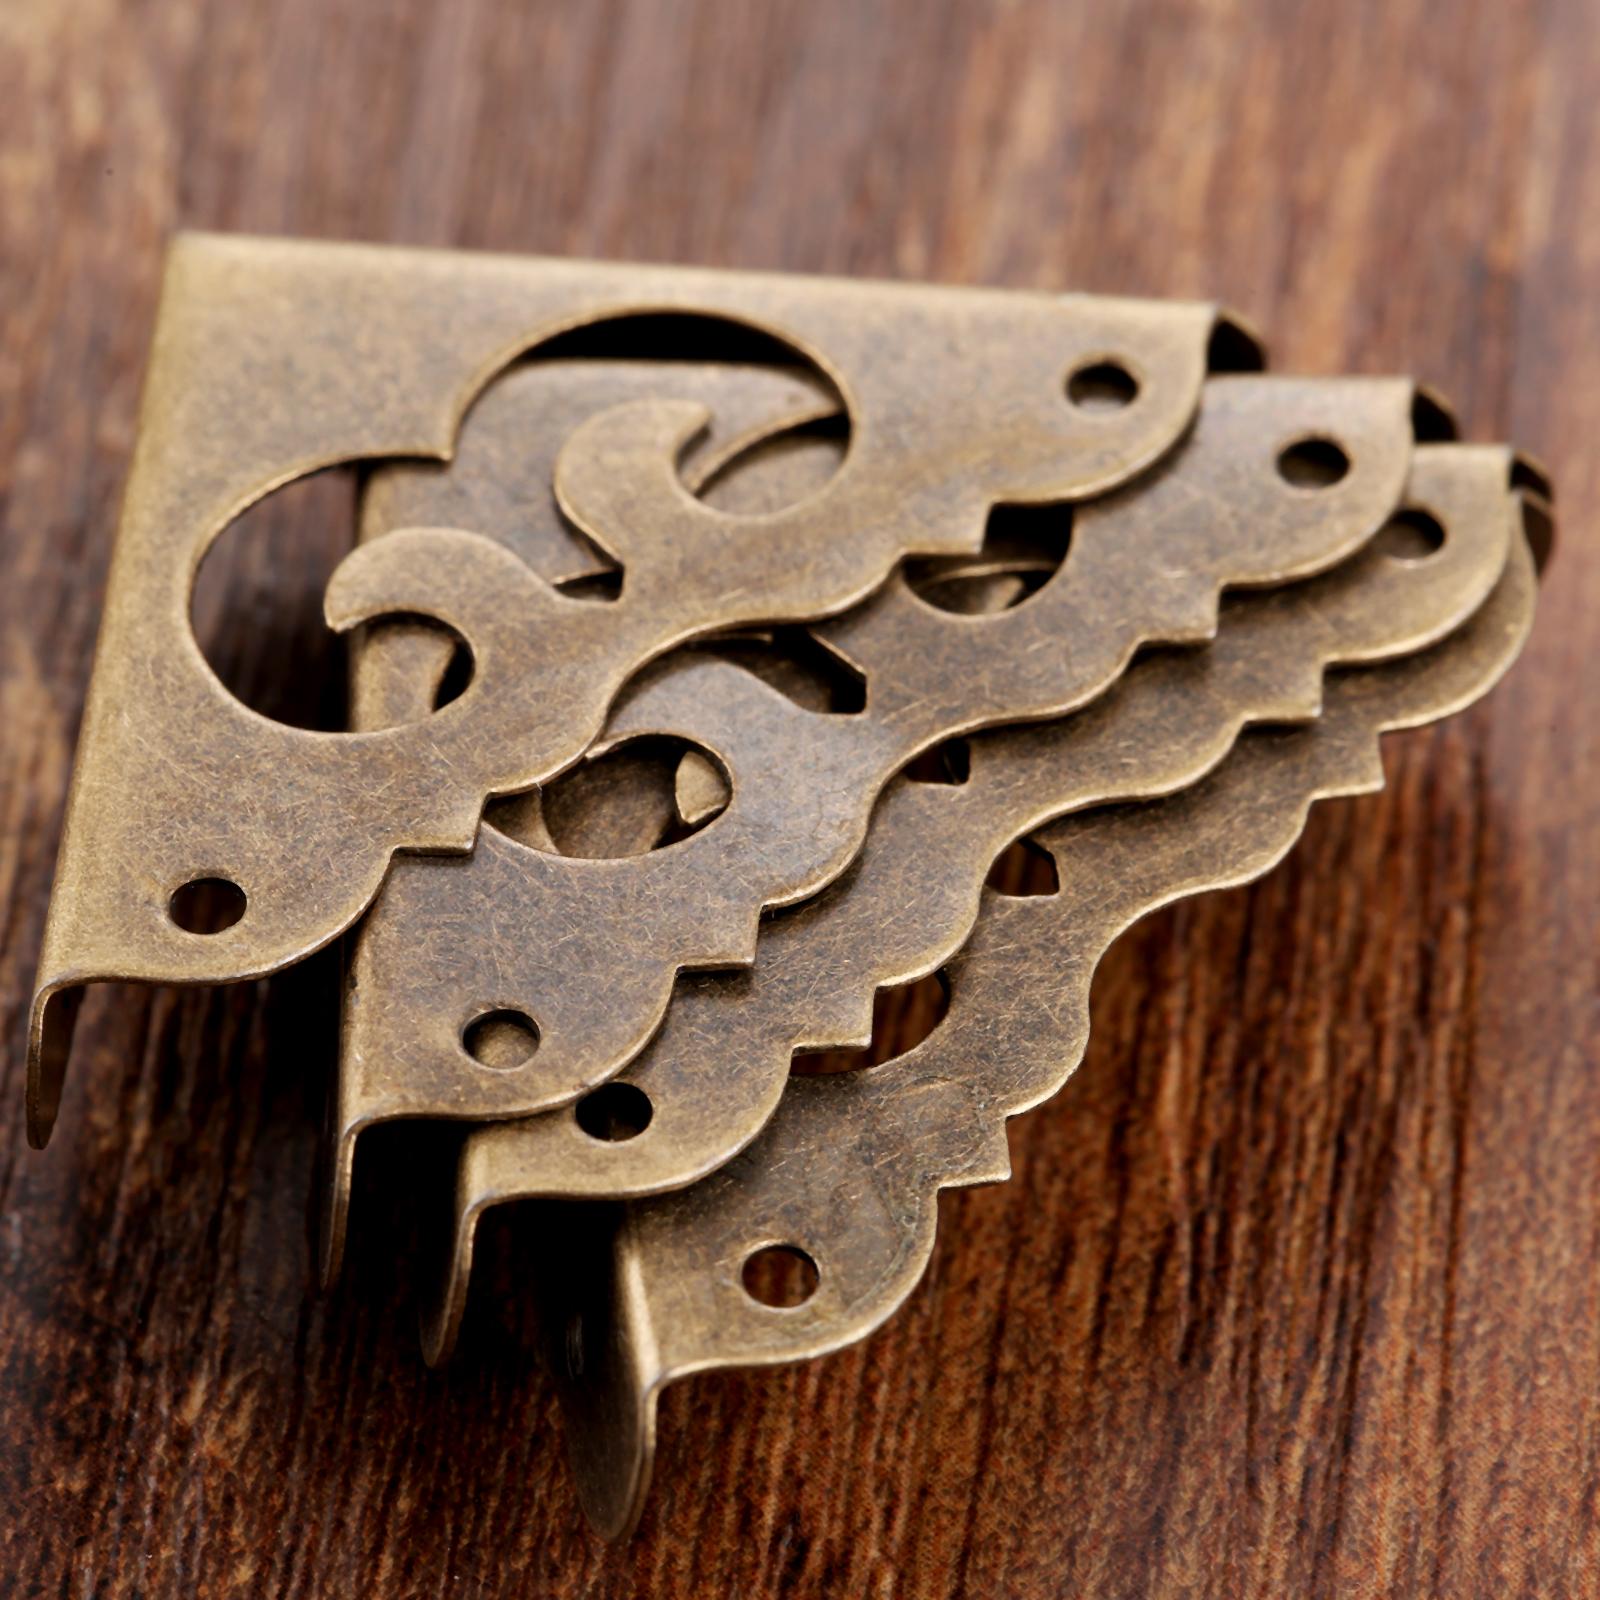 Decor Antique brass Jewelry Gift Box Wooden Corner Protector Guard Reuha